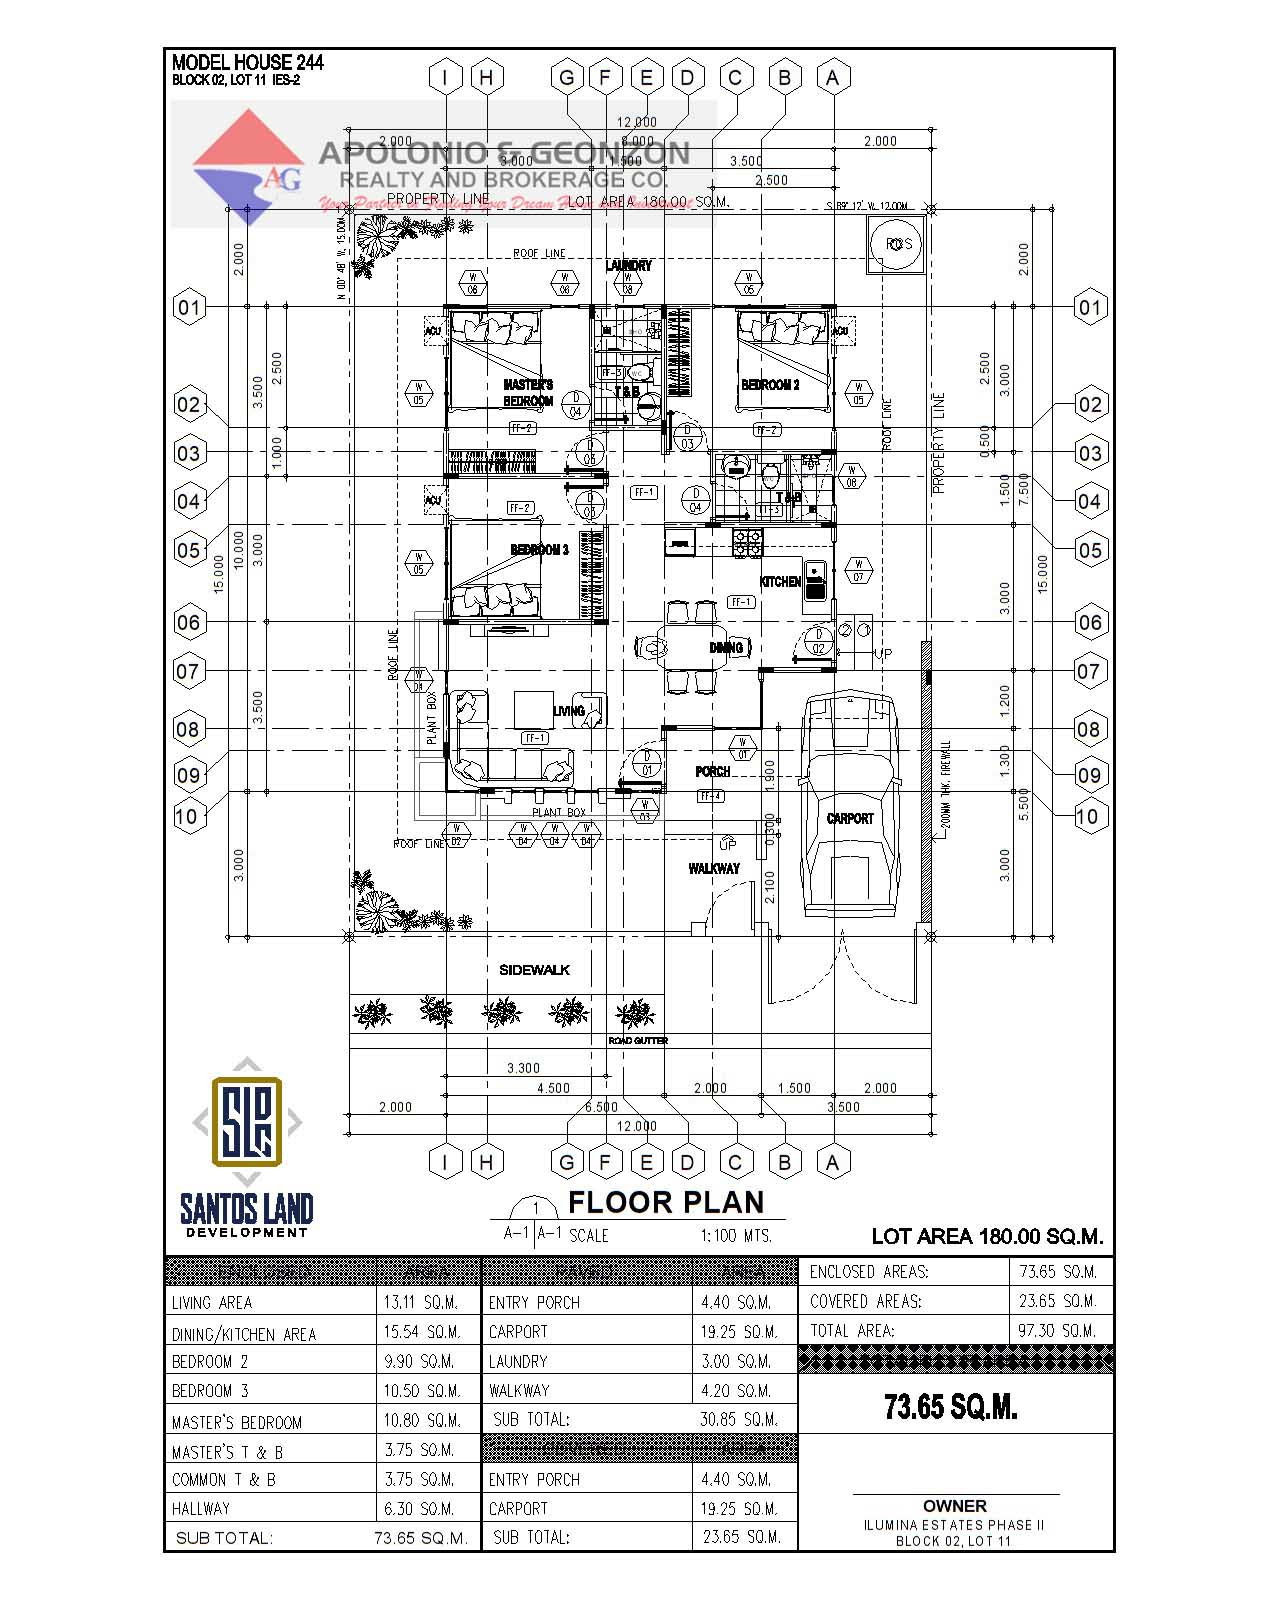 ilumina-estates-davao-model-house-244-floor-plan